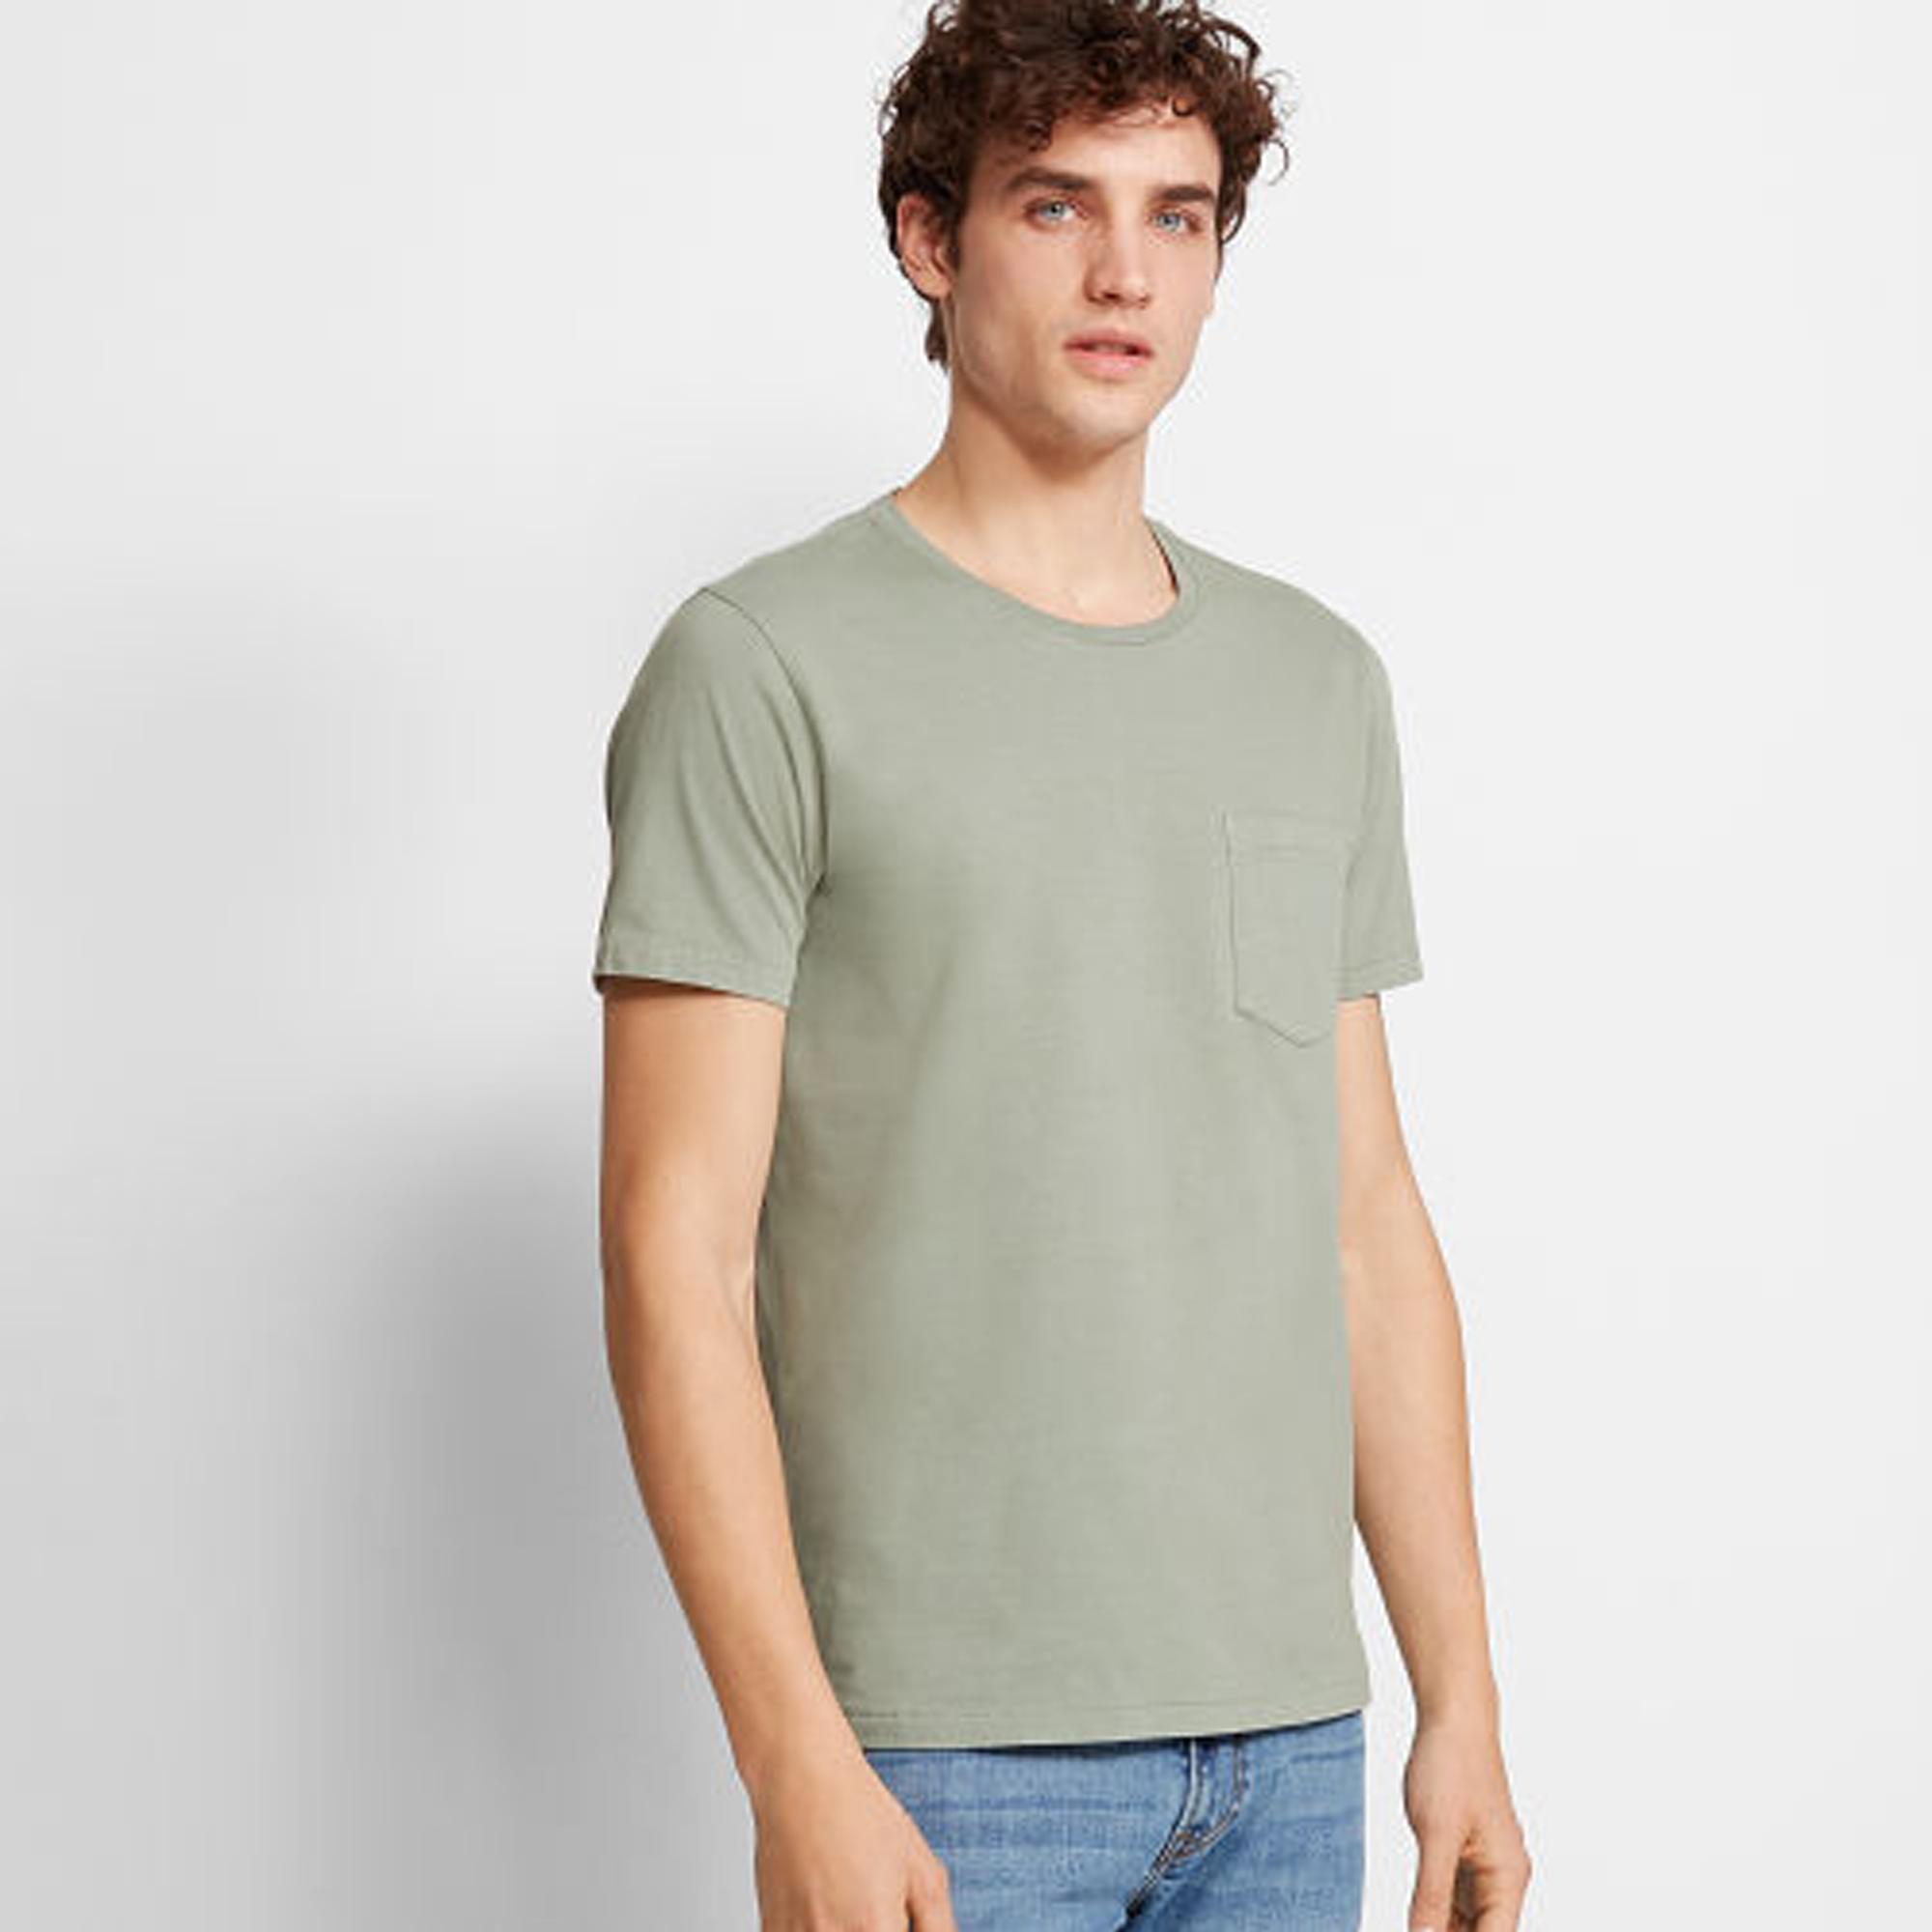 Williams Garment-Dyed Crew   HK$490